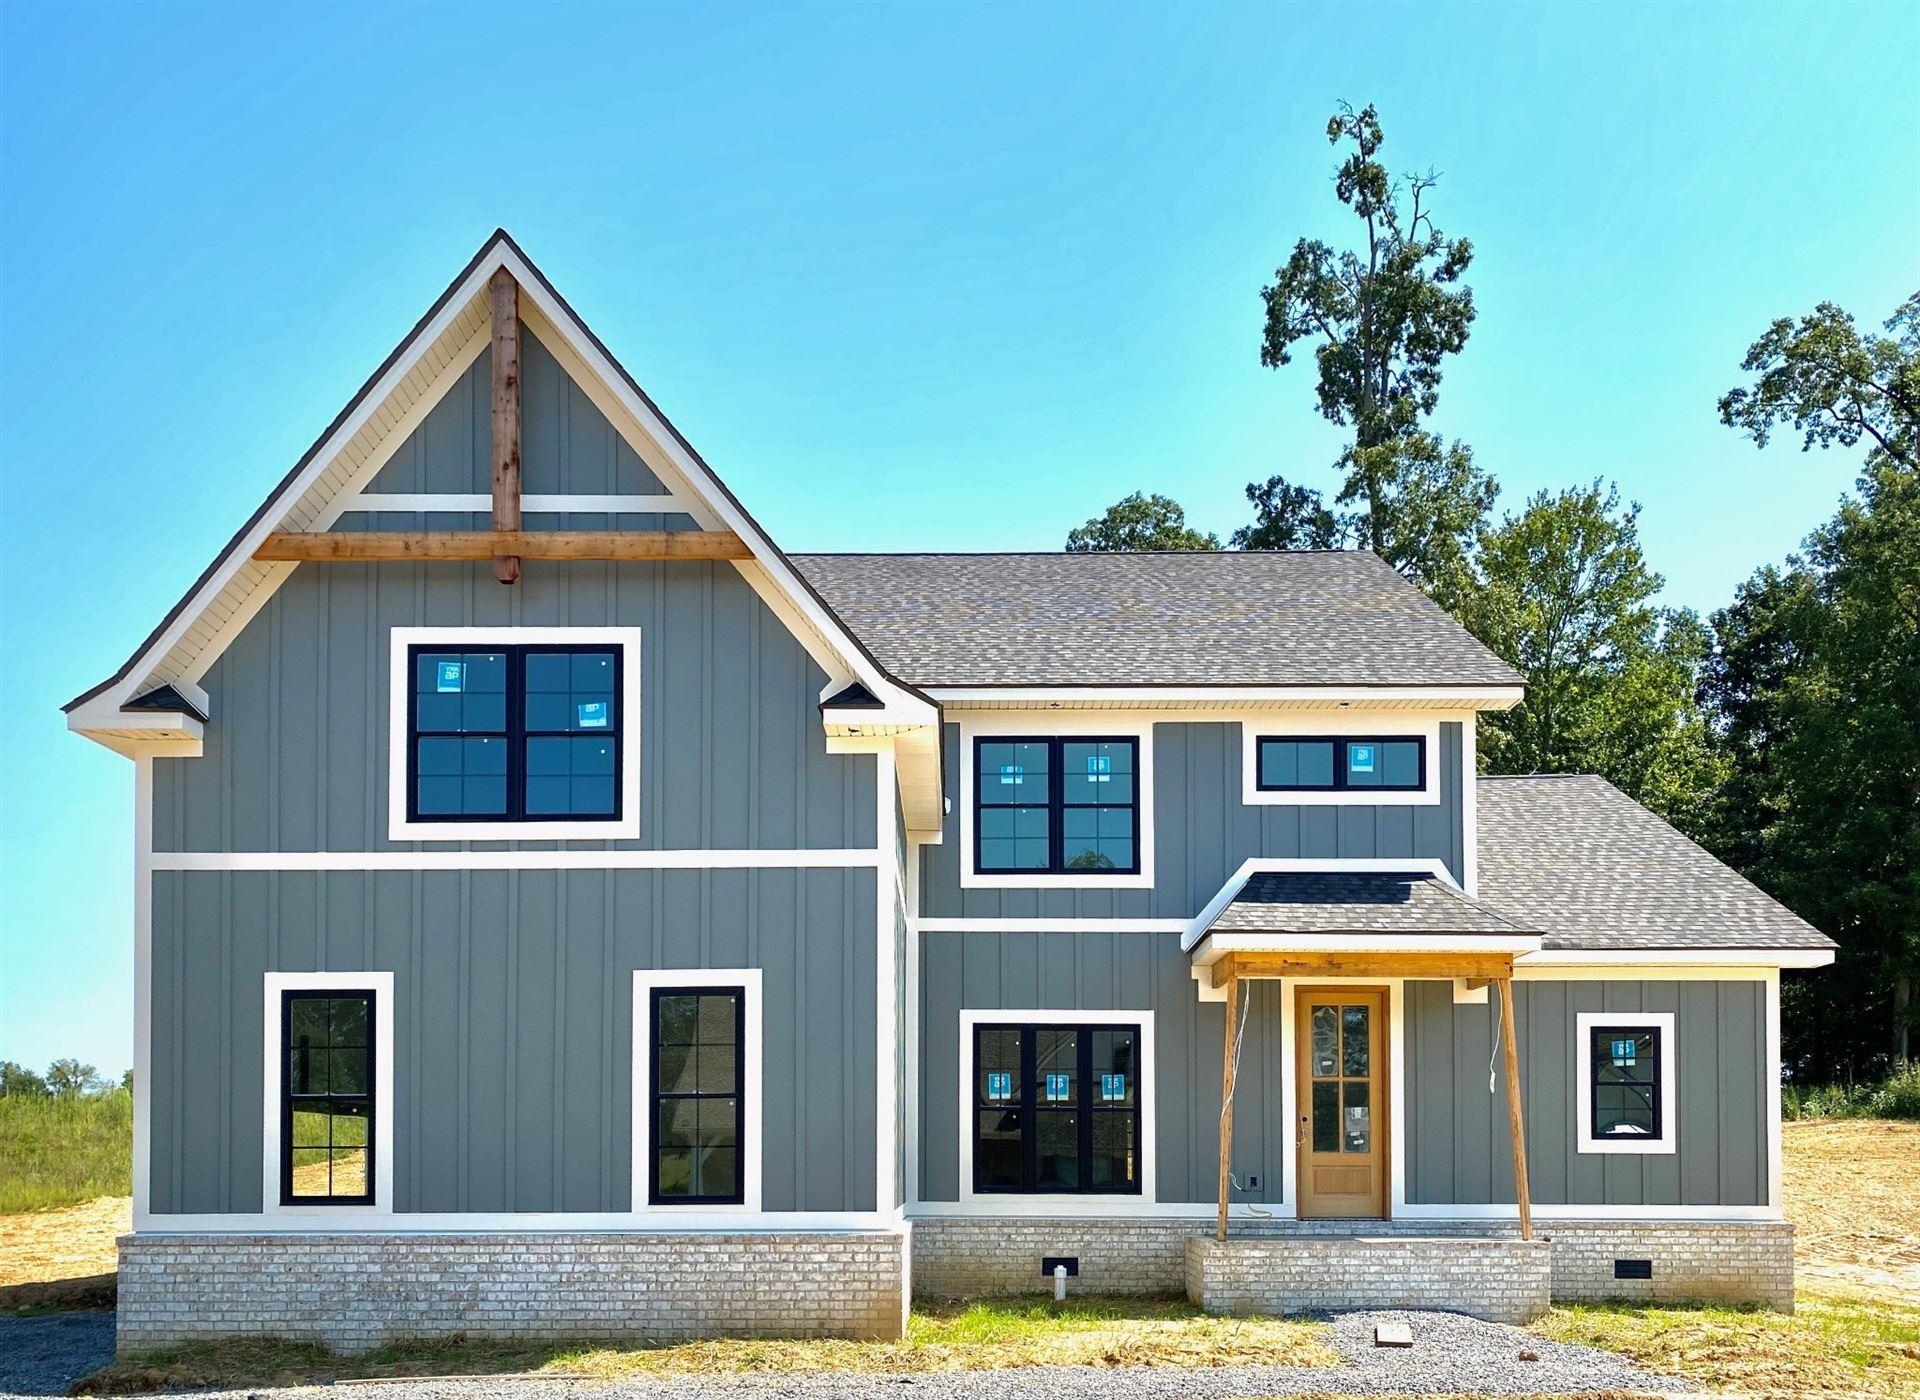 200 Barnview Drive, Clarksville, TN 37043 - MLS#: 2217115